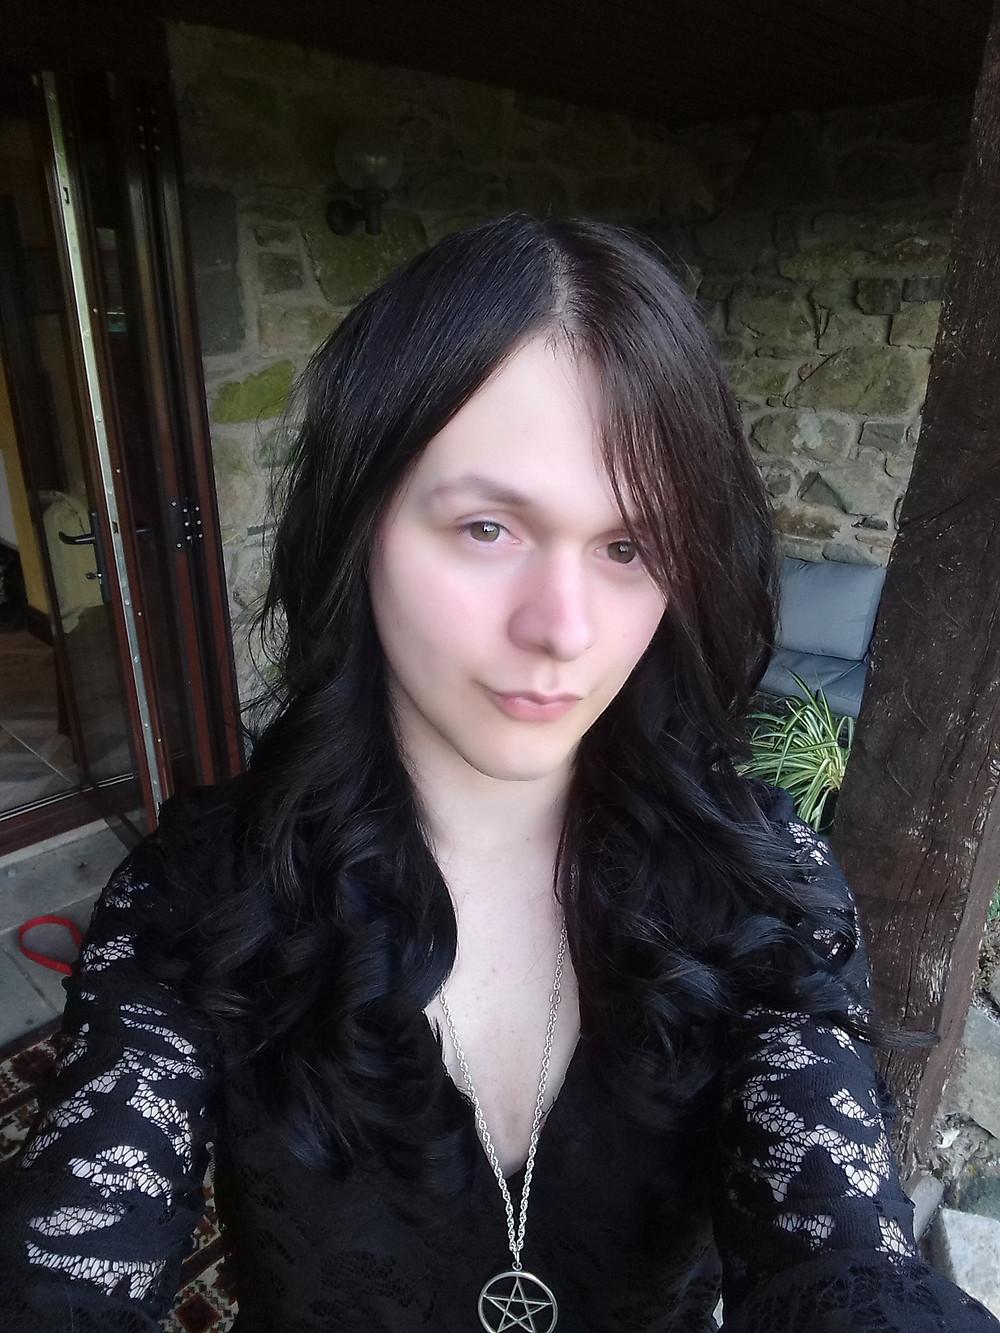 Zedek Creations owner Lilith Morrigan Hicks